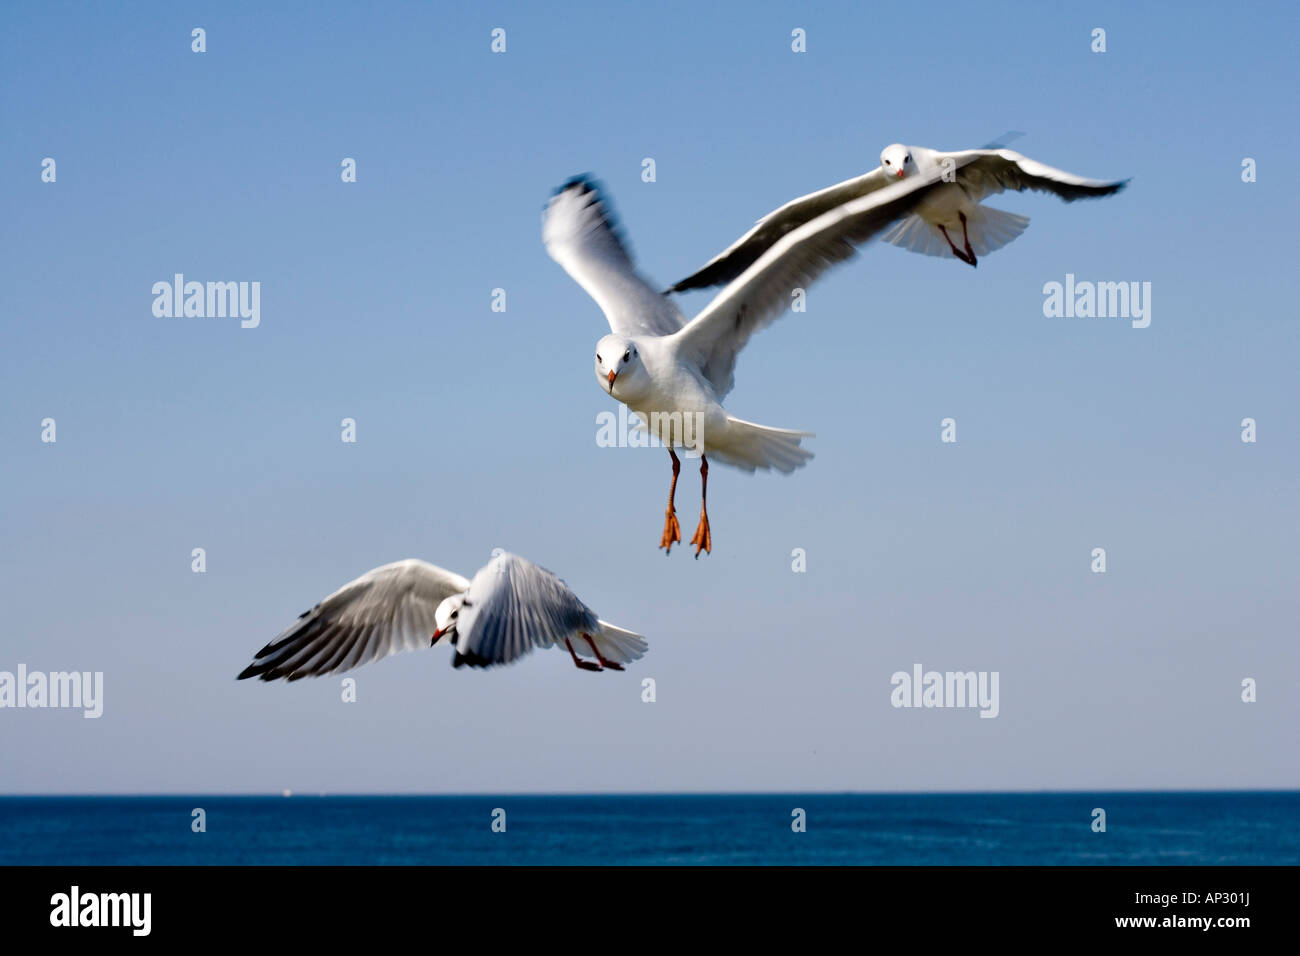 Seagulls, Ruegen, Mecklenburg-Western Pomerania, Germany - Stock Image